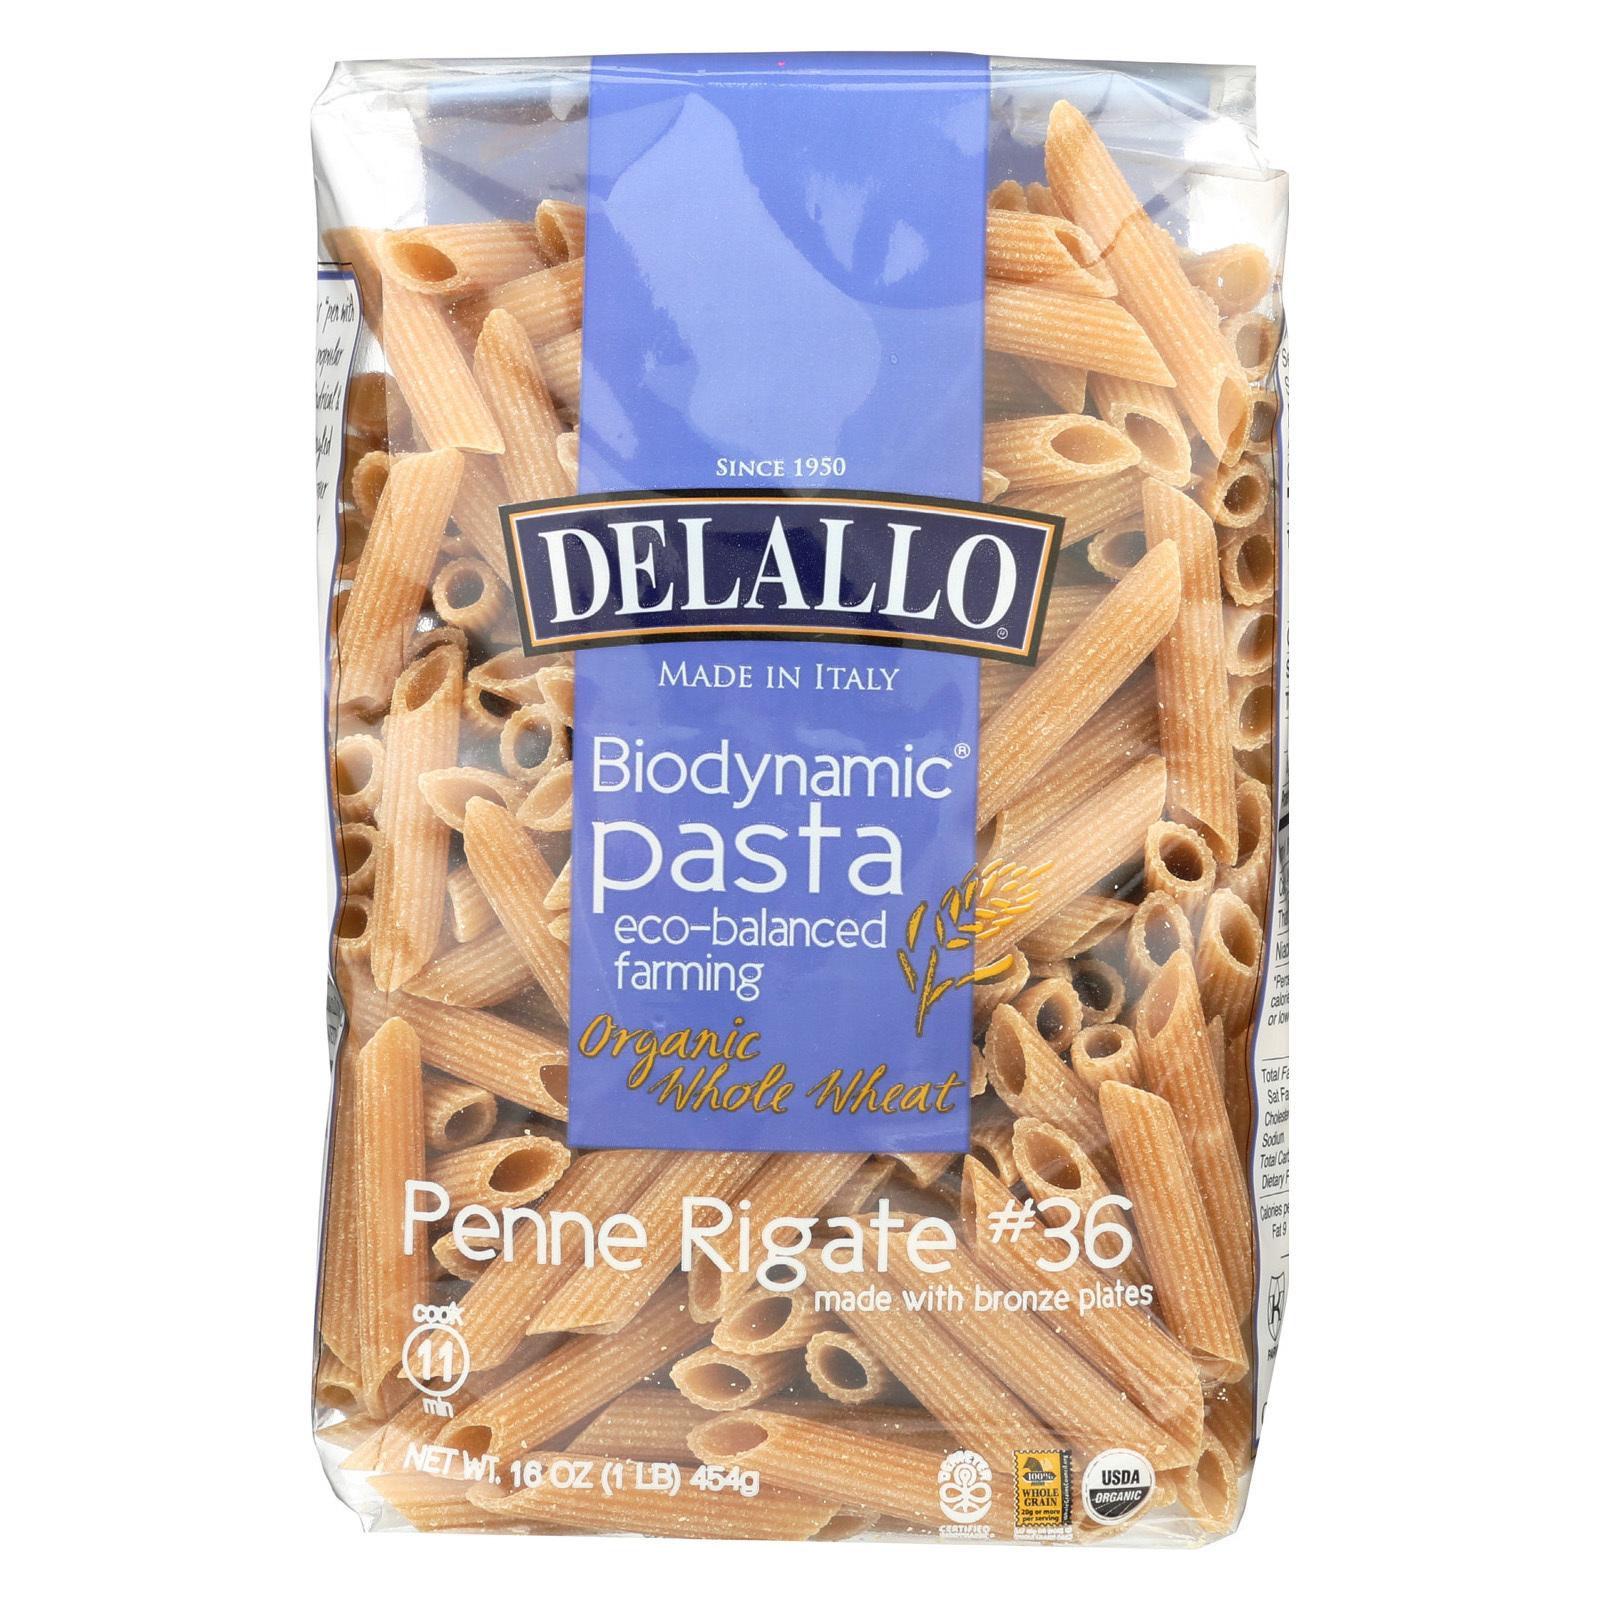 Delallo Biodynamic - Organic - Whole Wheat - Pnne Rigat - Case of 16 - 16 oz